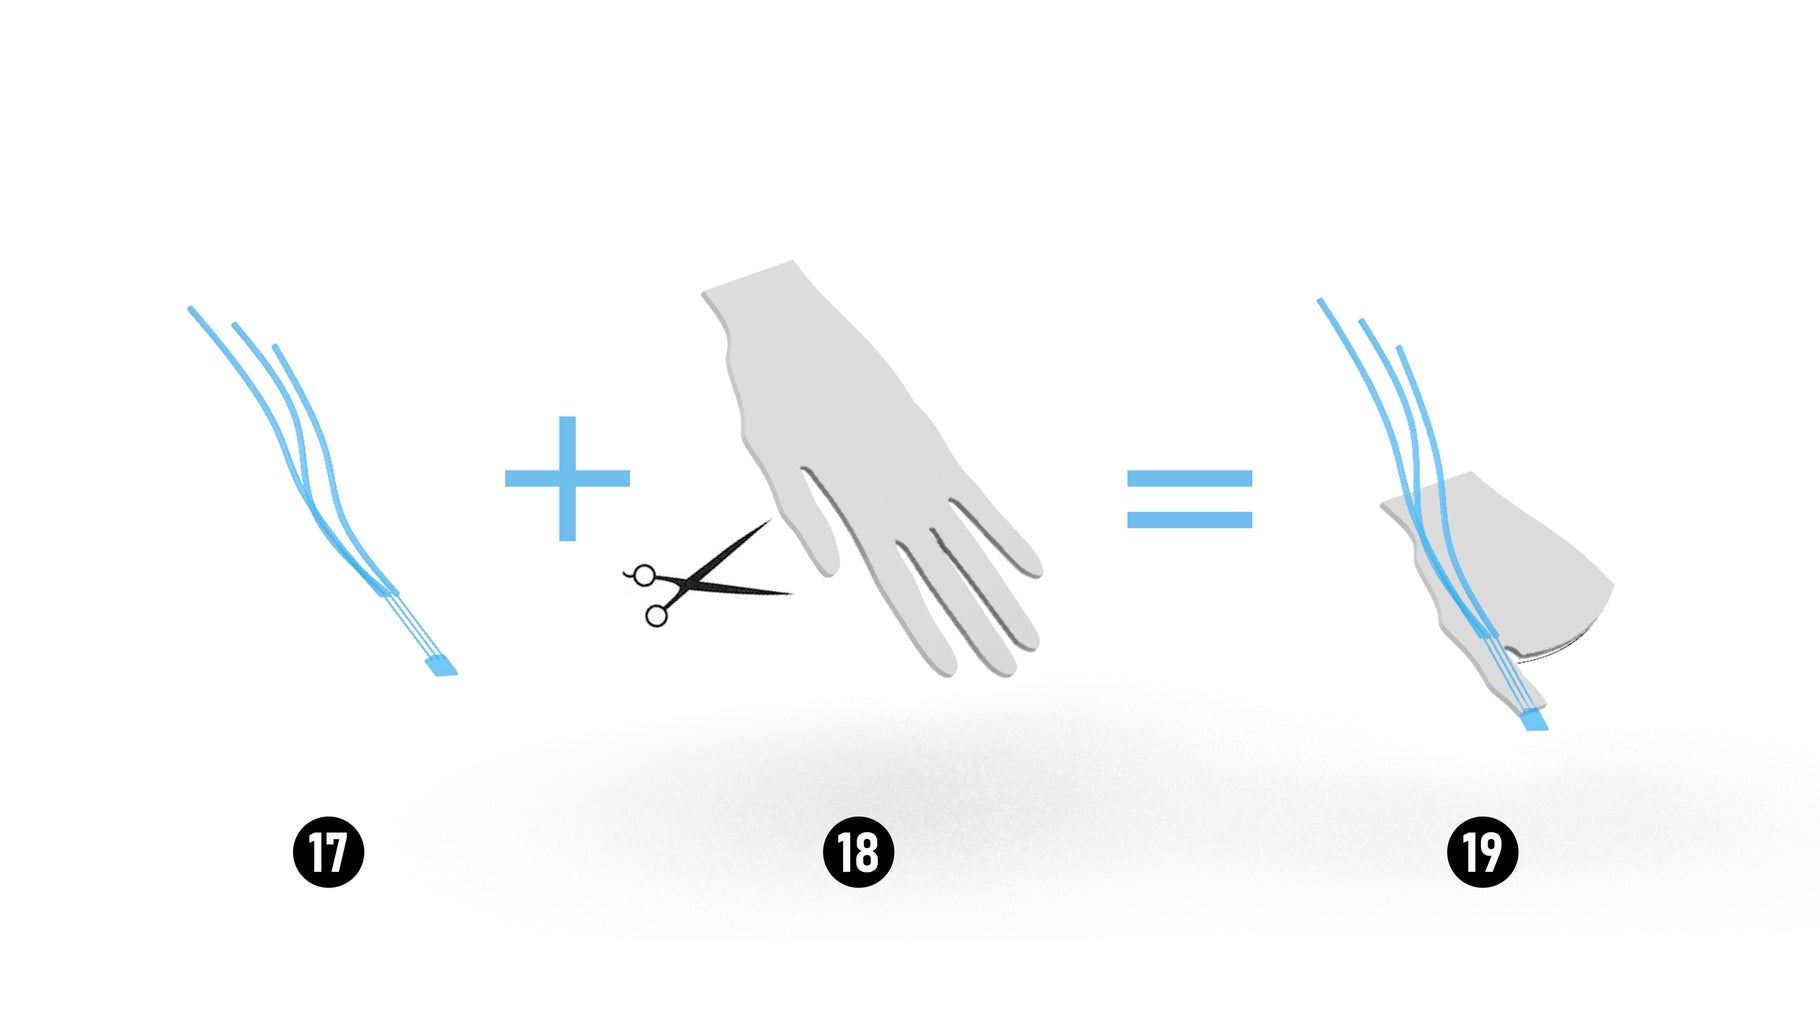 Assembling the Glove (Optional)